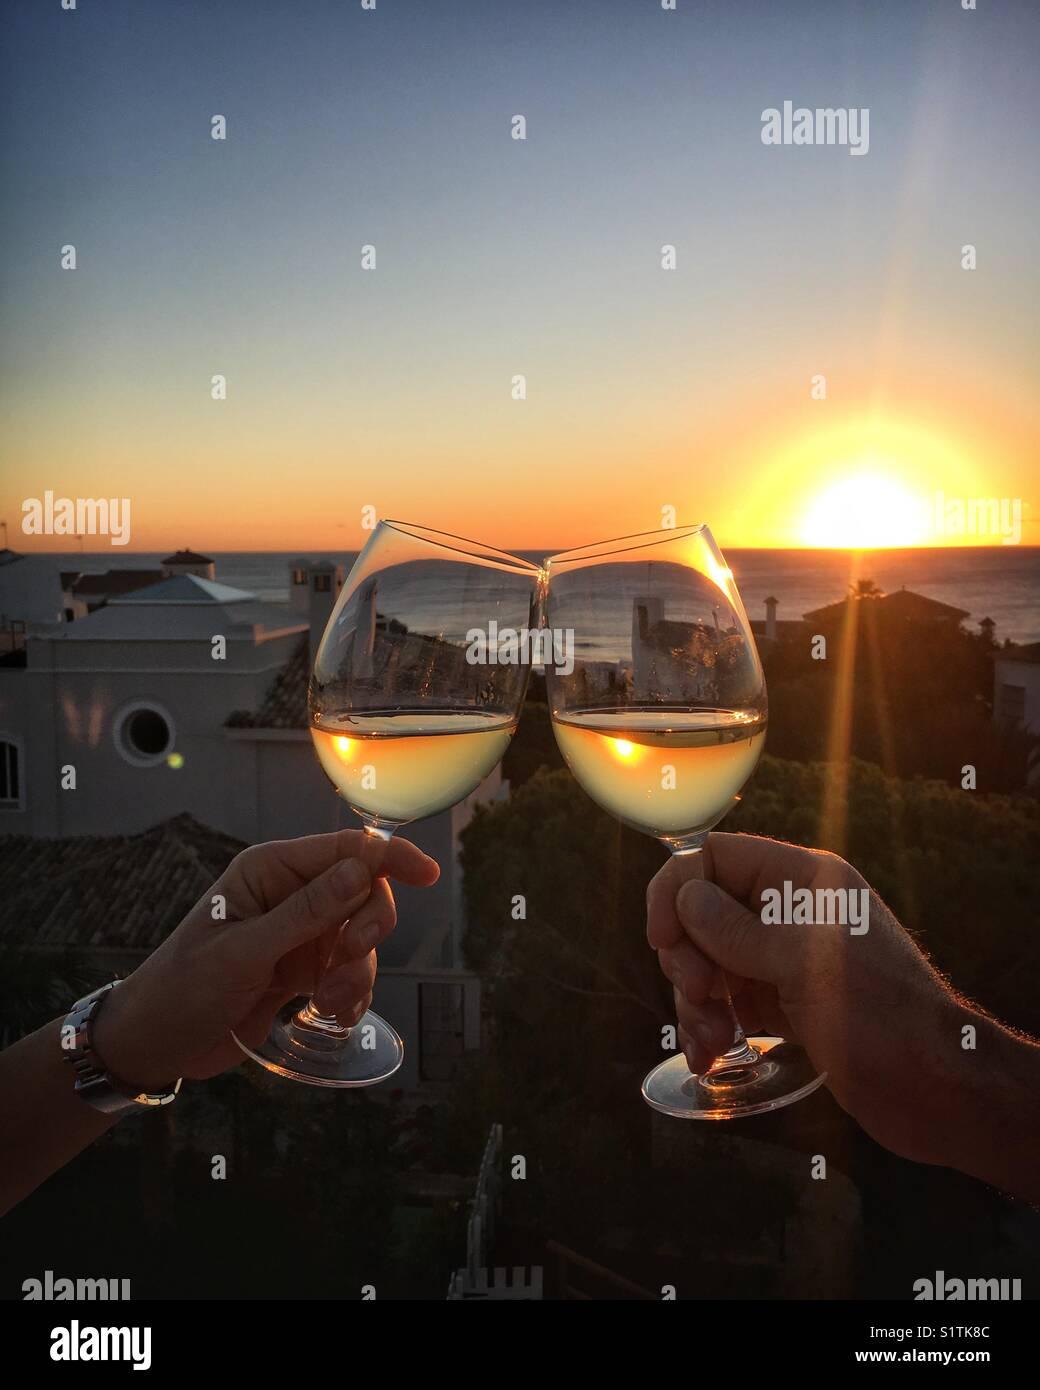 Due bicchieri di vino tintinnanti insieme al tramonto. saluti! Immagini Stock